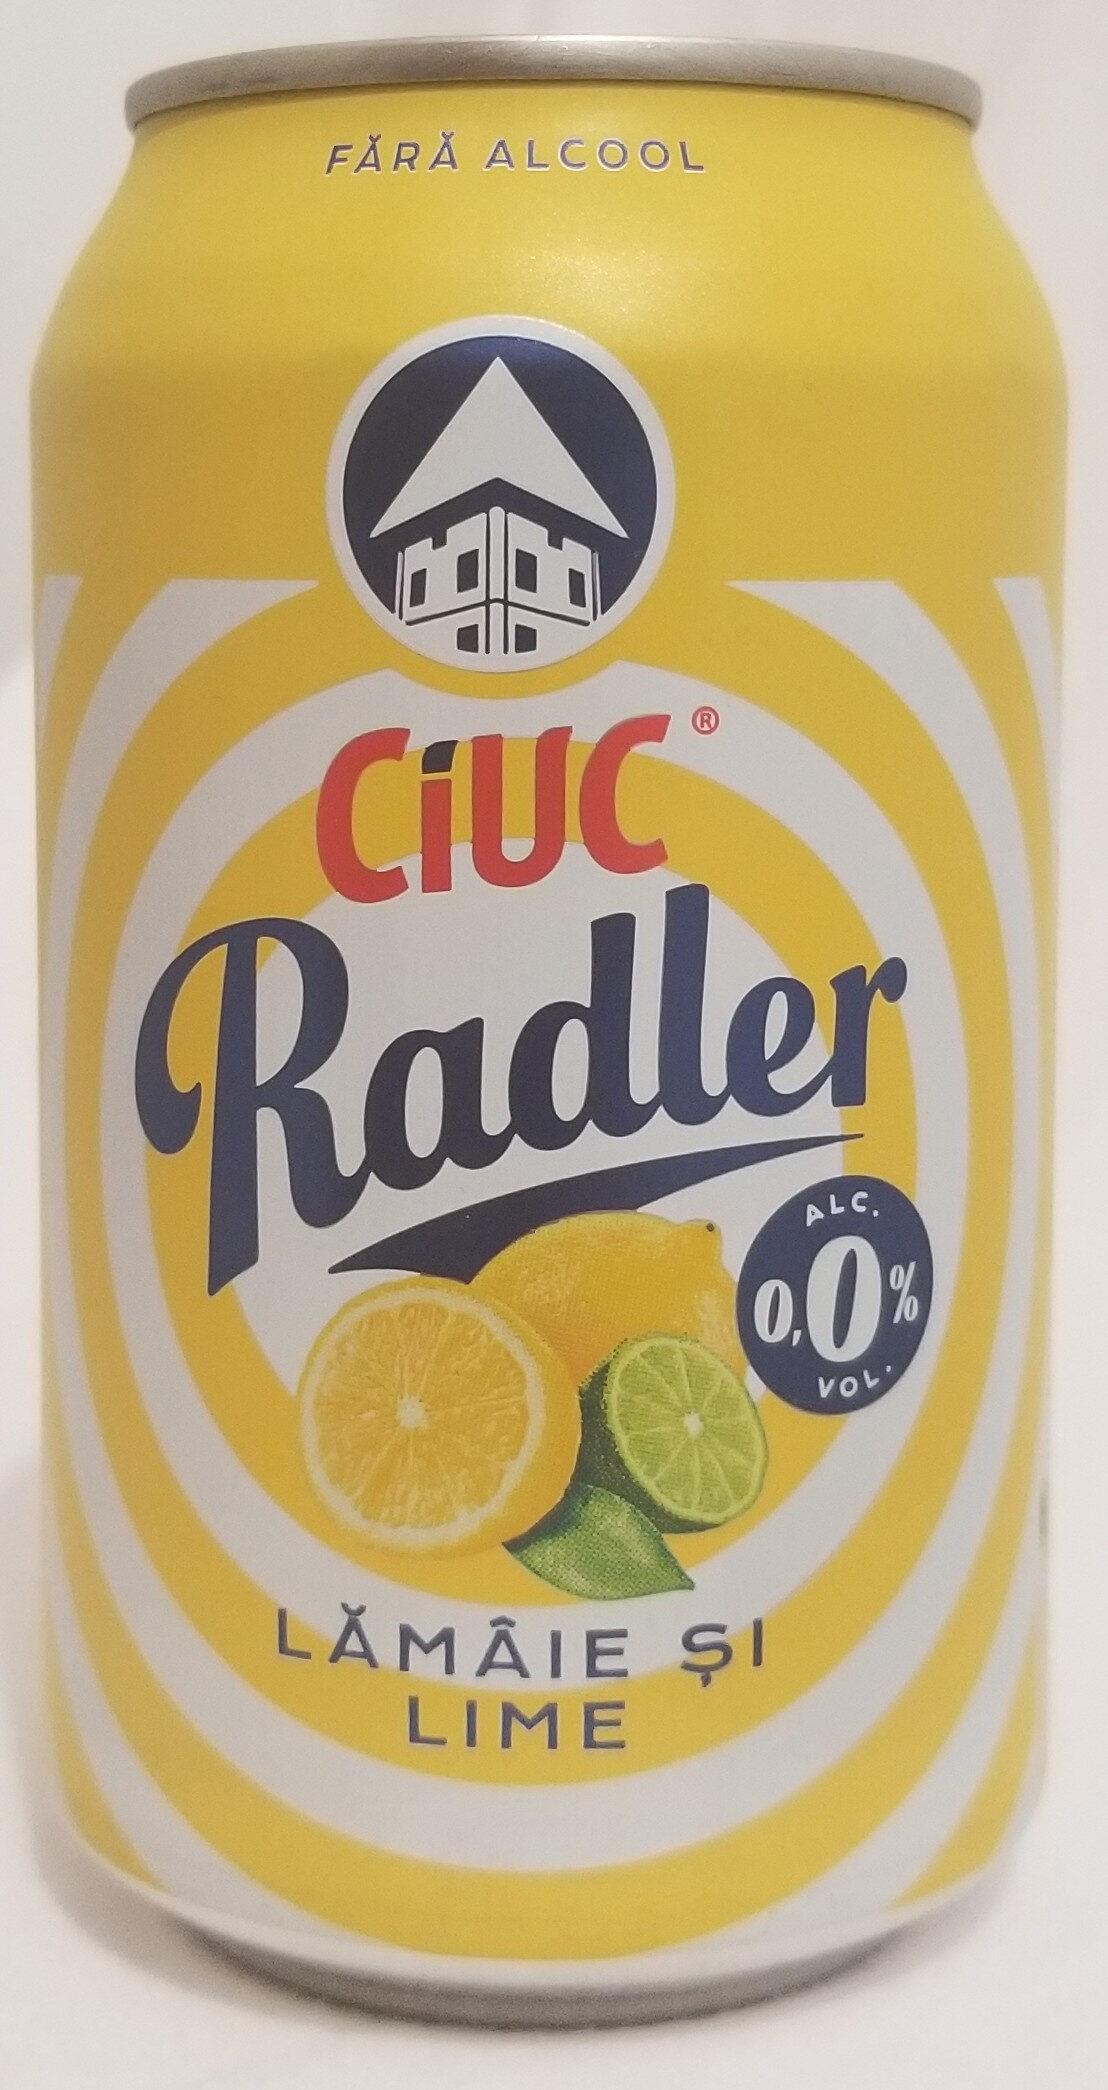 Ciuc Radler lămâie și lime 0,0% - Product